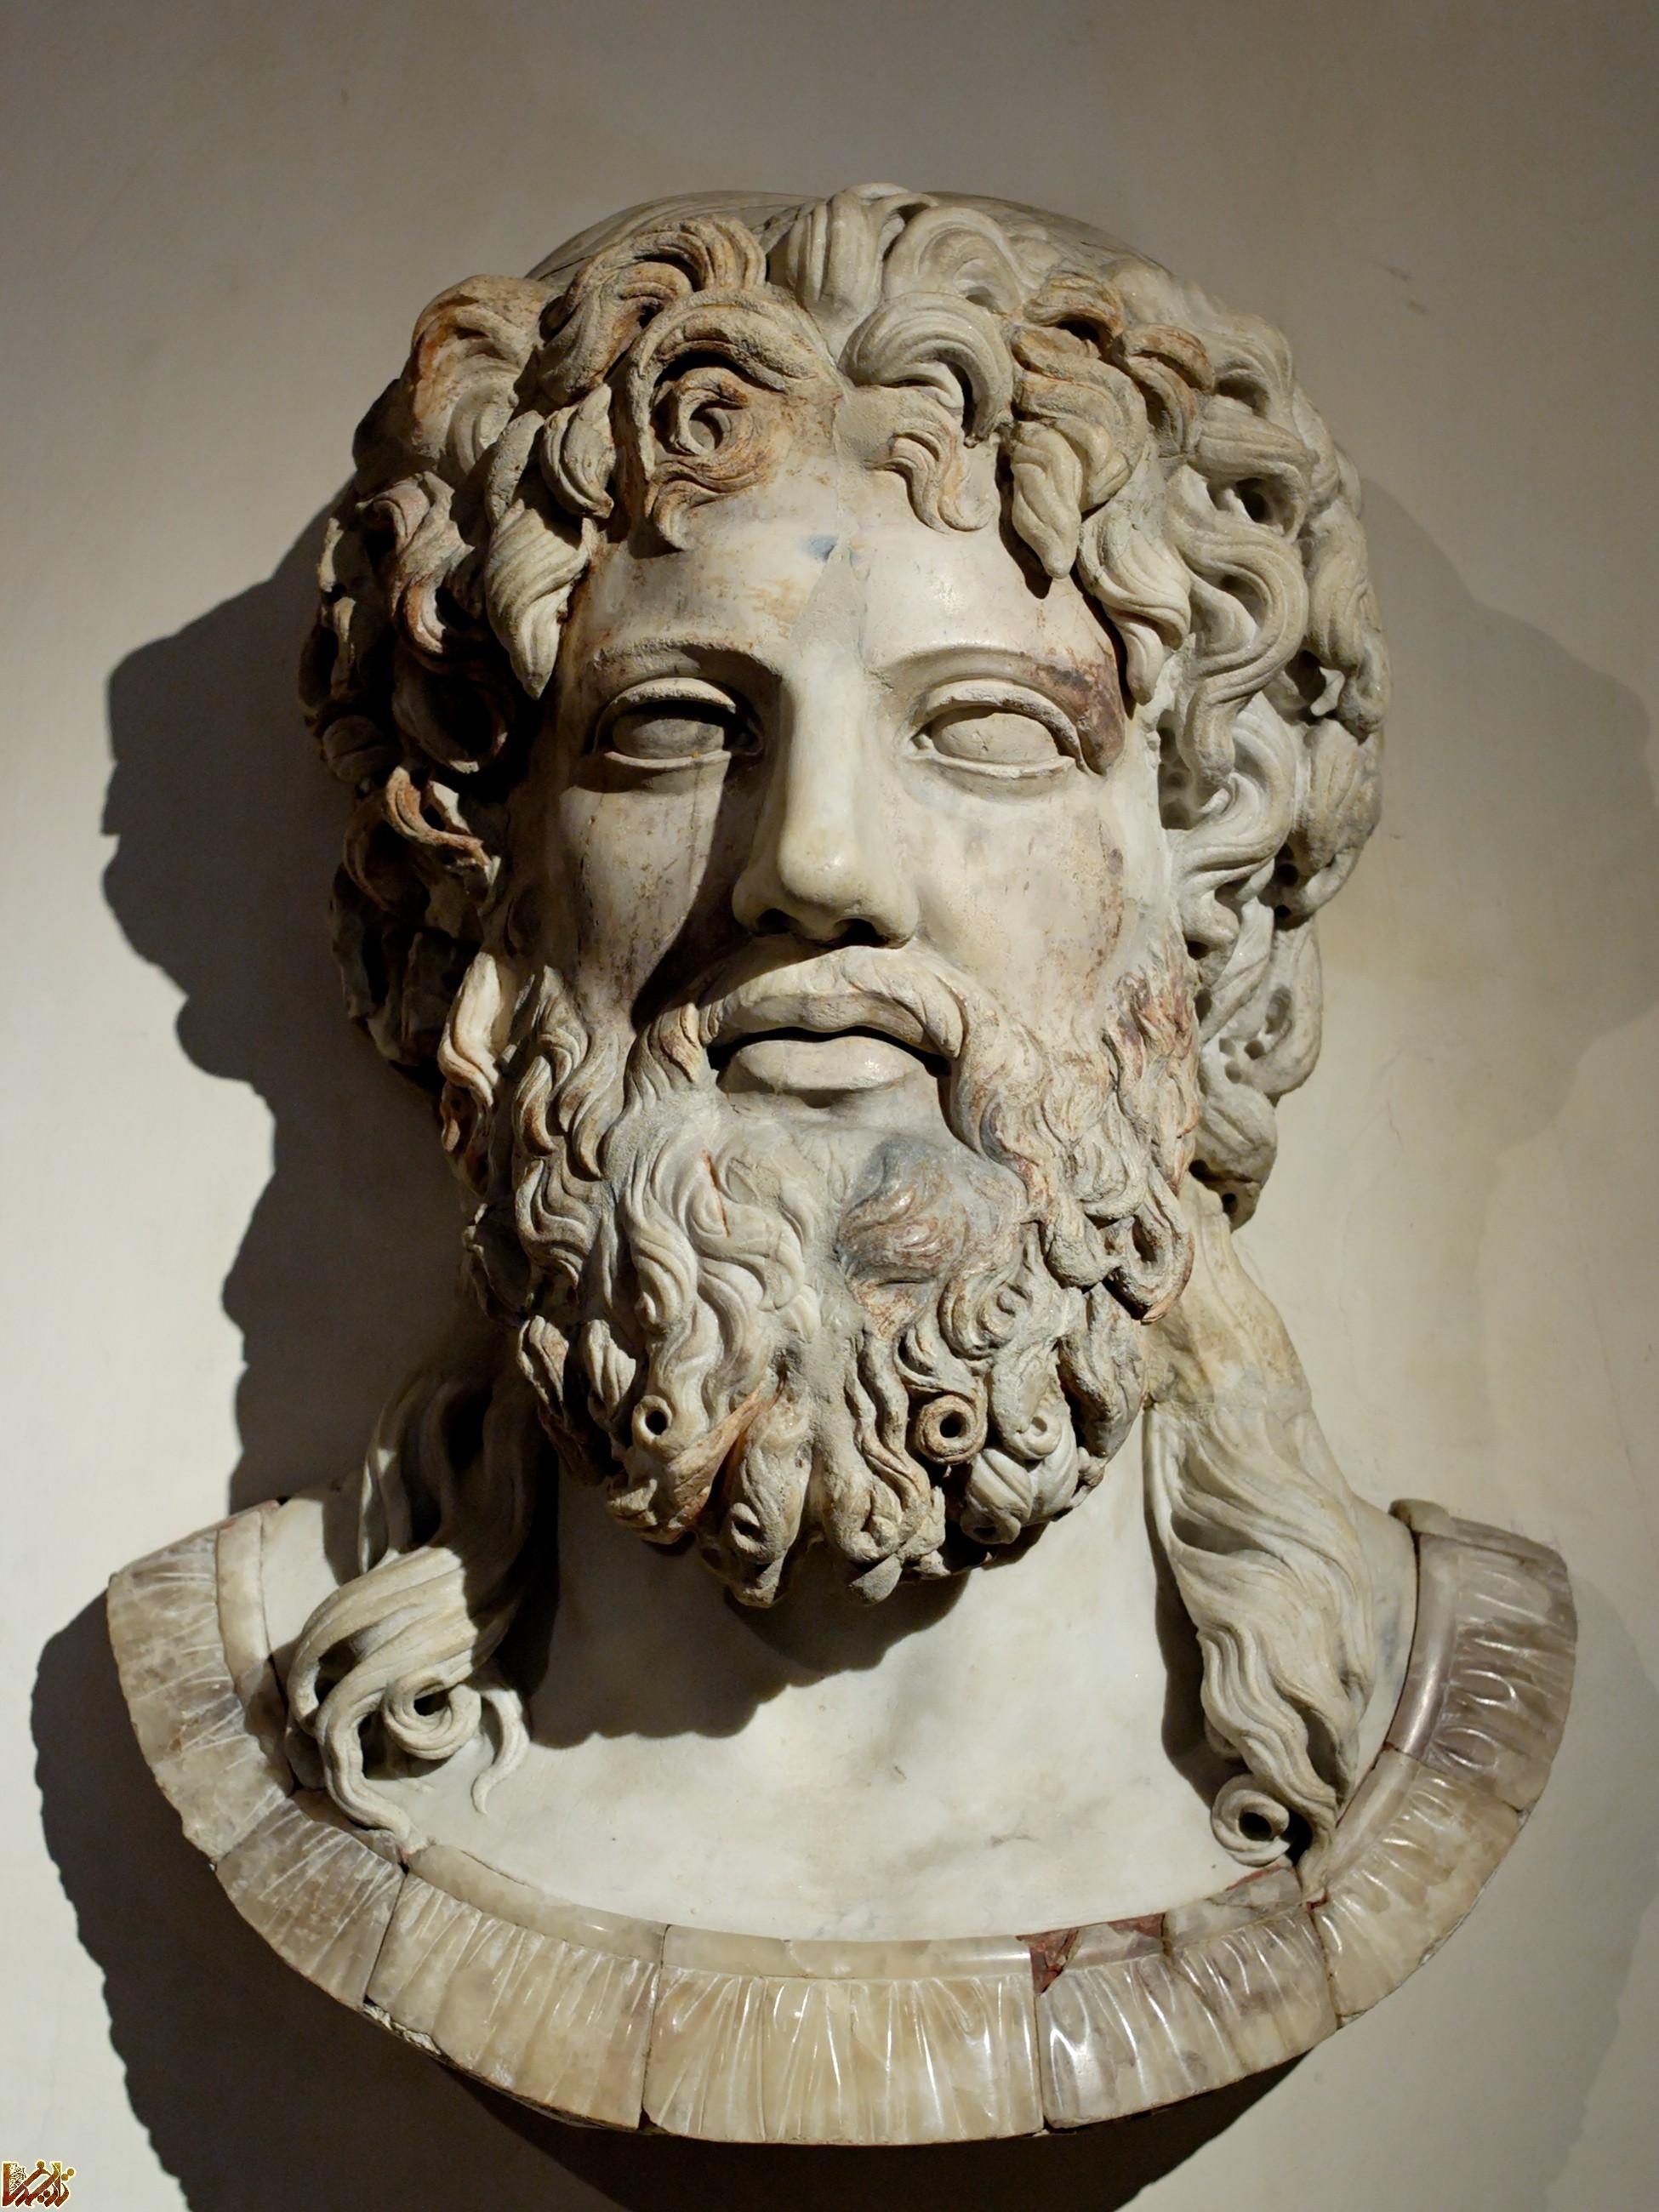 http://tarikhema.org/images/2011/09/Zeus_Altemps_Inv86351.jpg